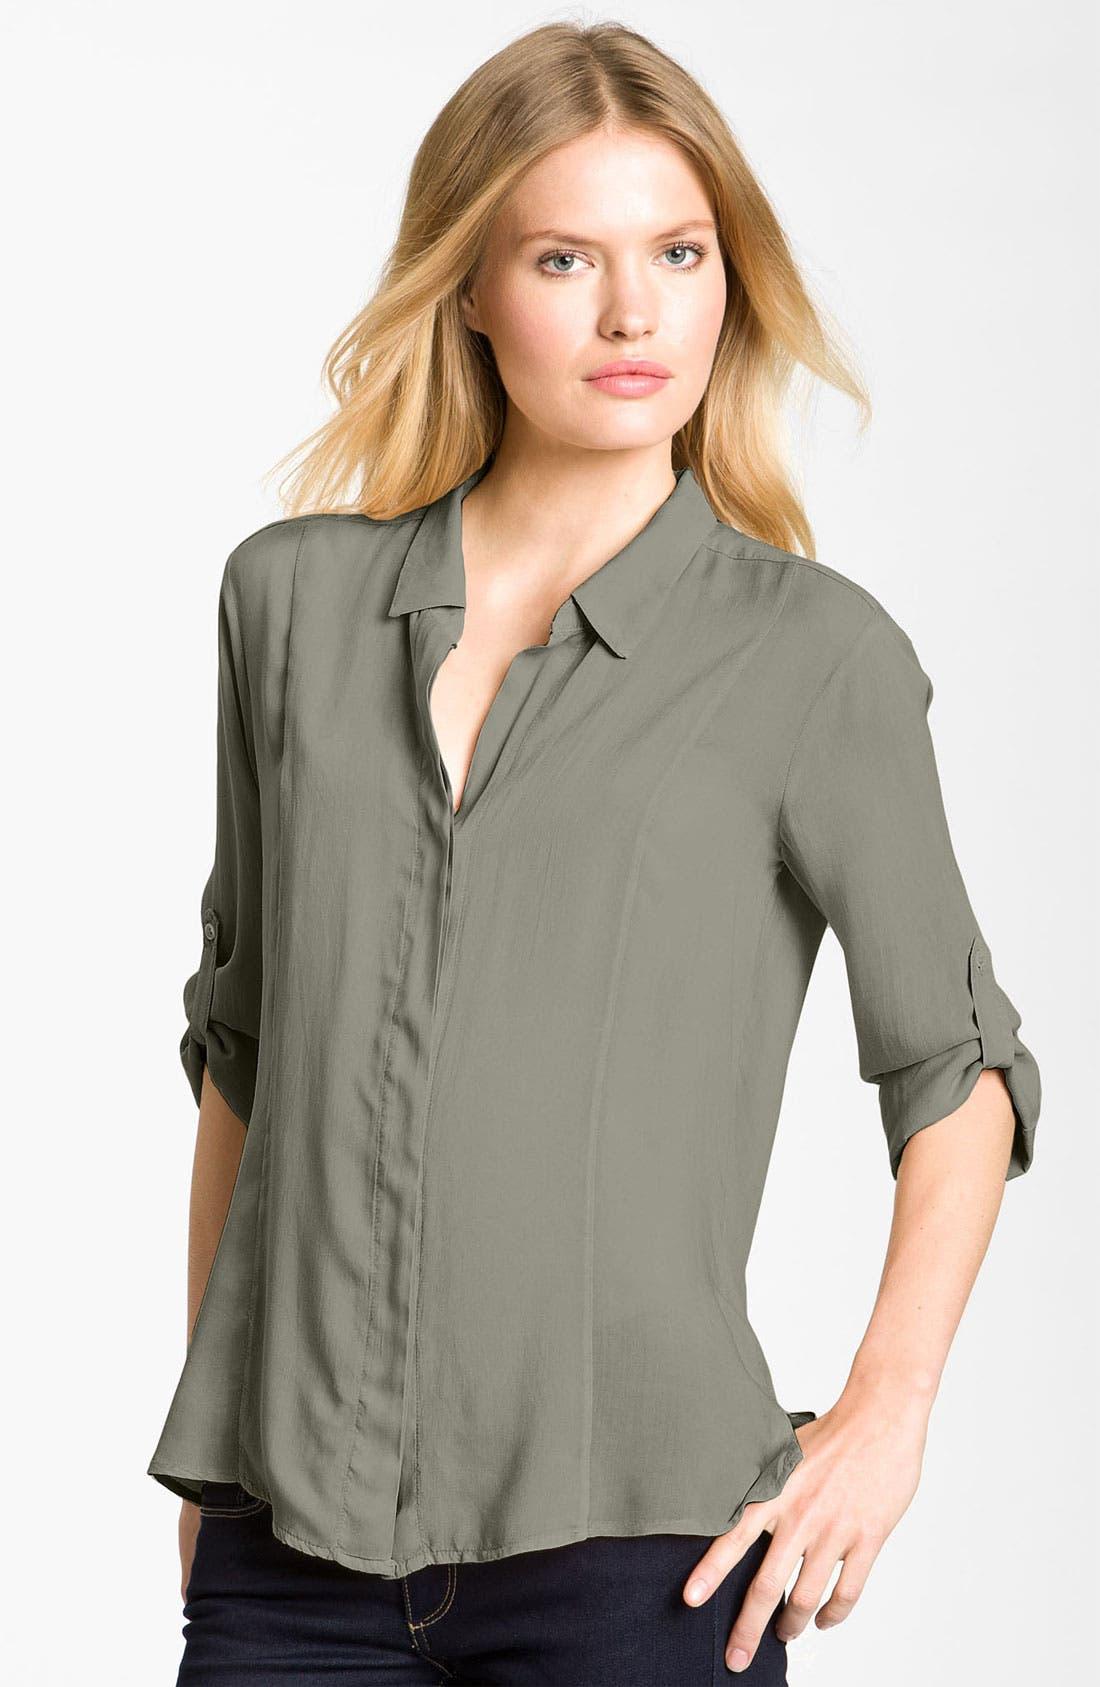 Alternate Image 1 Selected - James Perse Chiffon Tab Sleeve Shirt